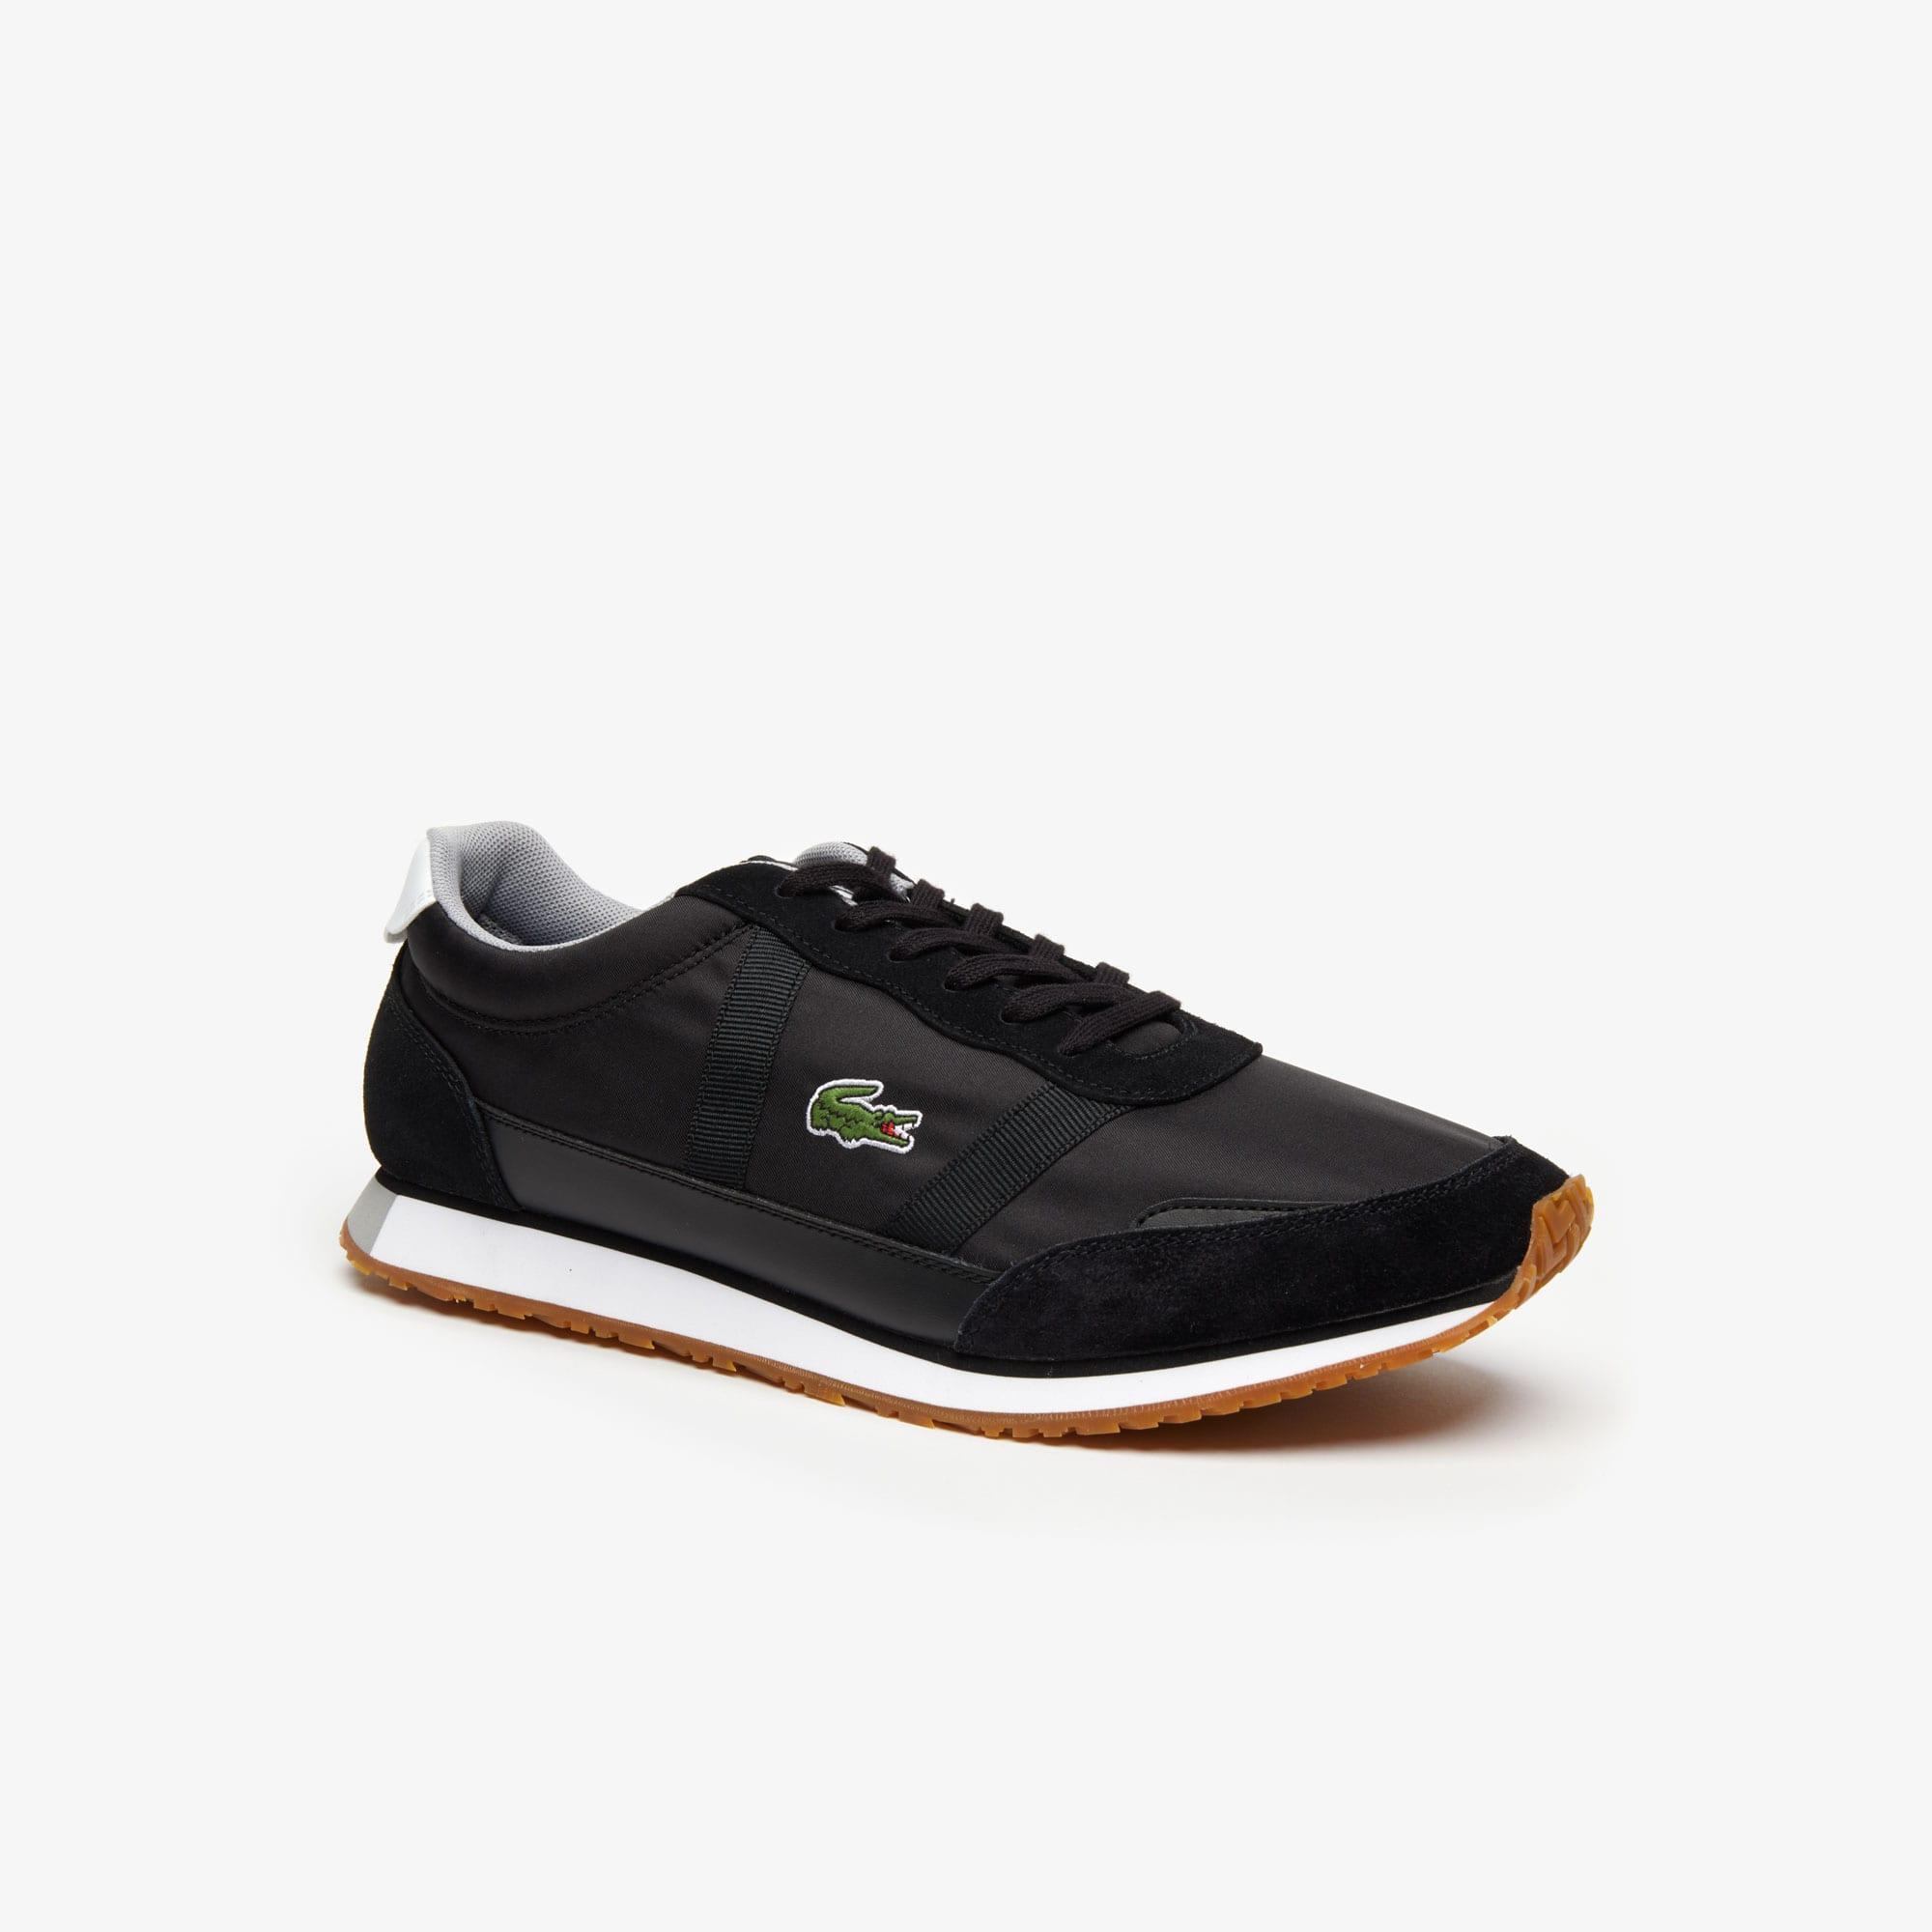 Lacoste Herren-Sneakers PARTNER aus Textil und Veloursleder - BLACK WHITE Size 42